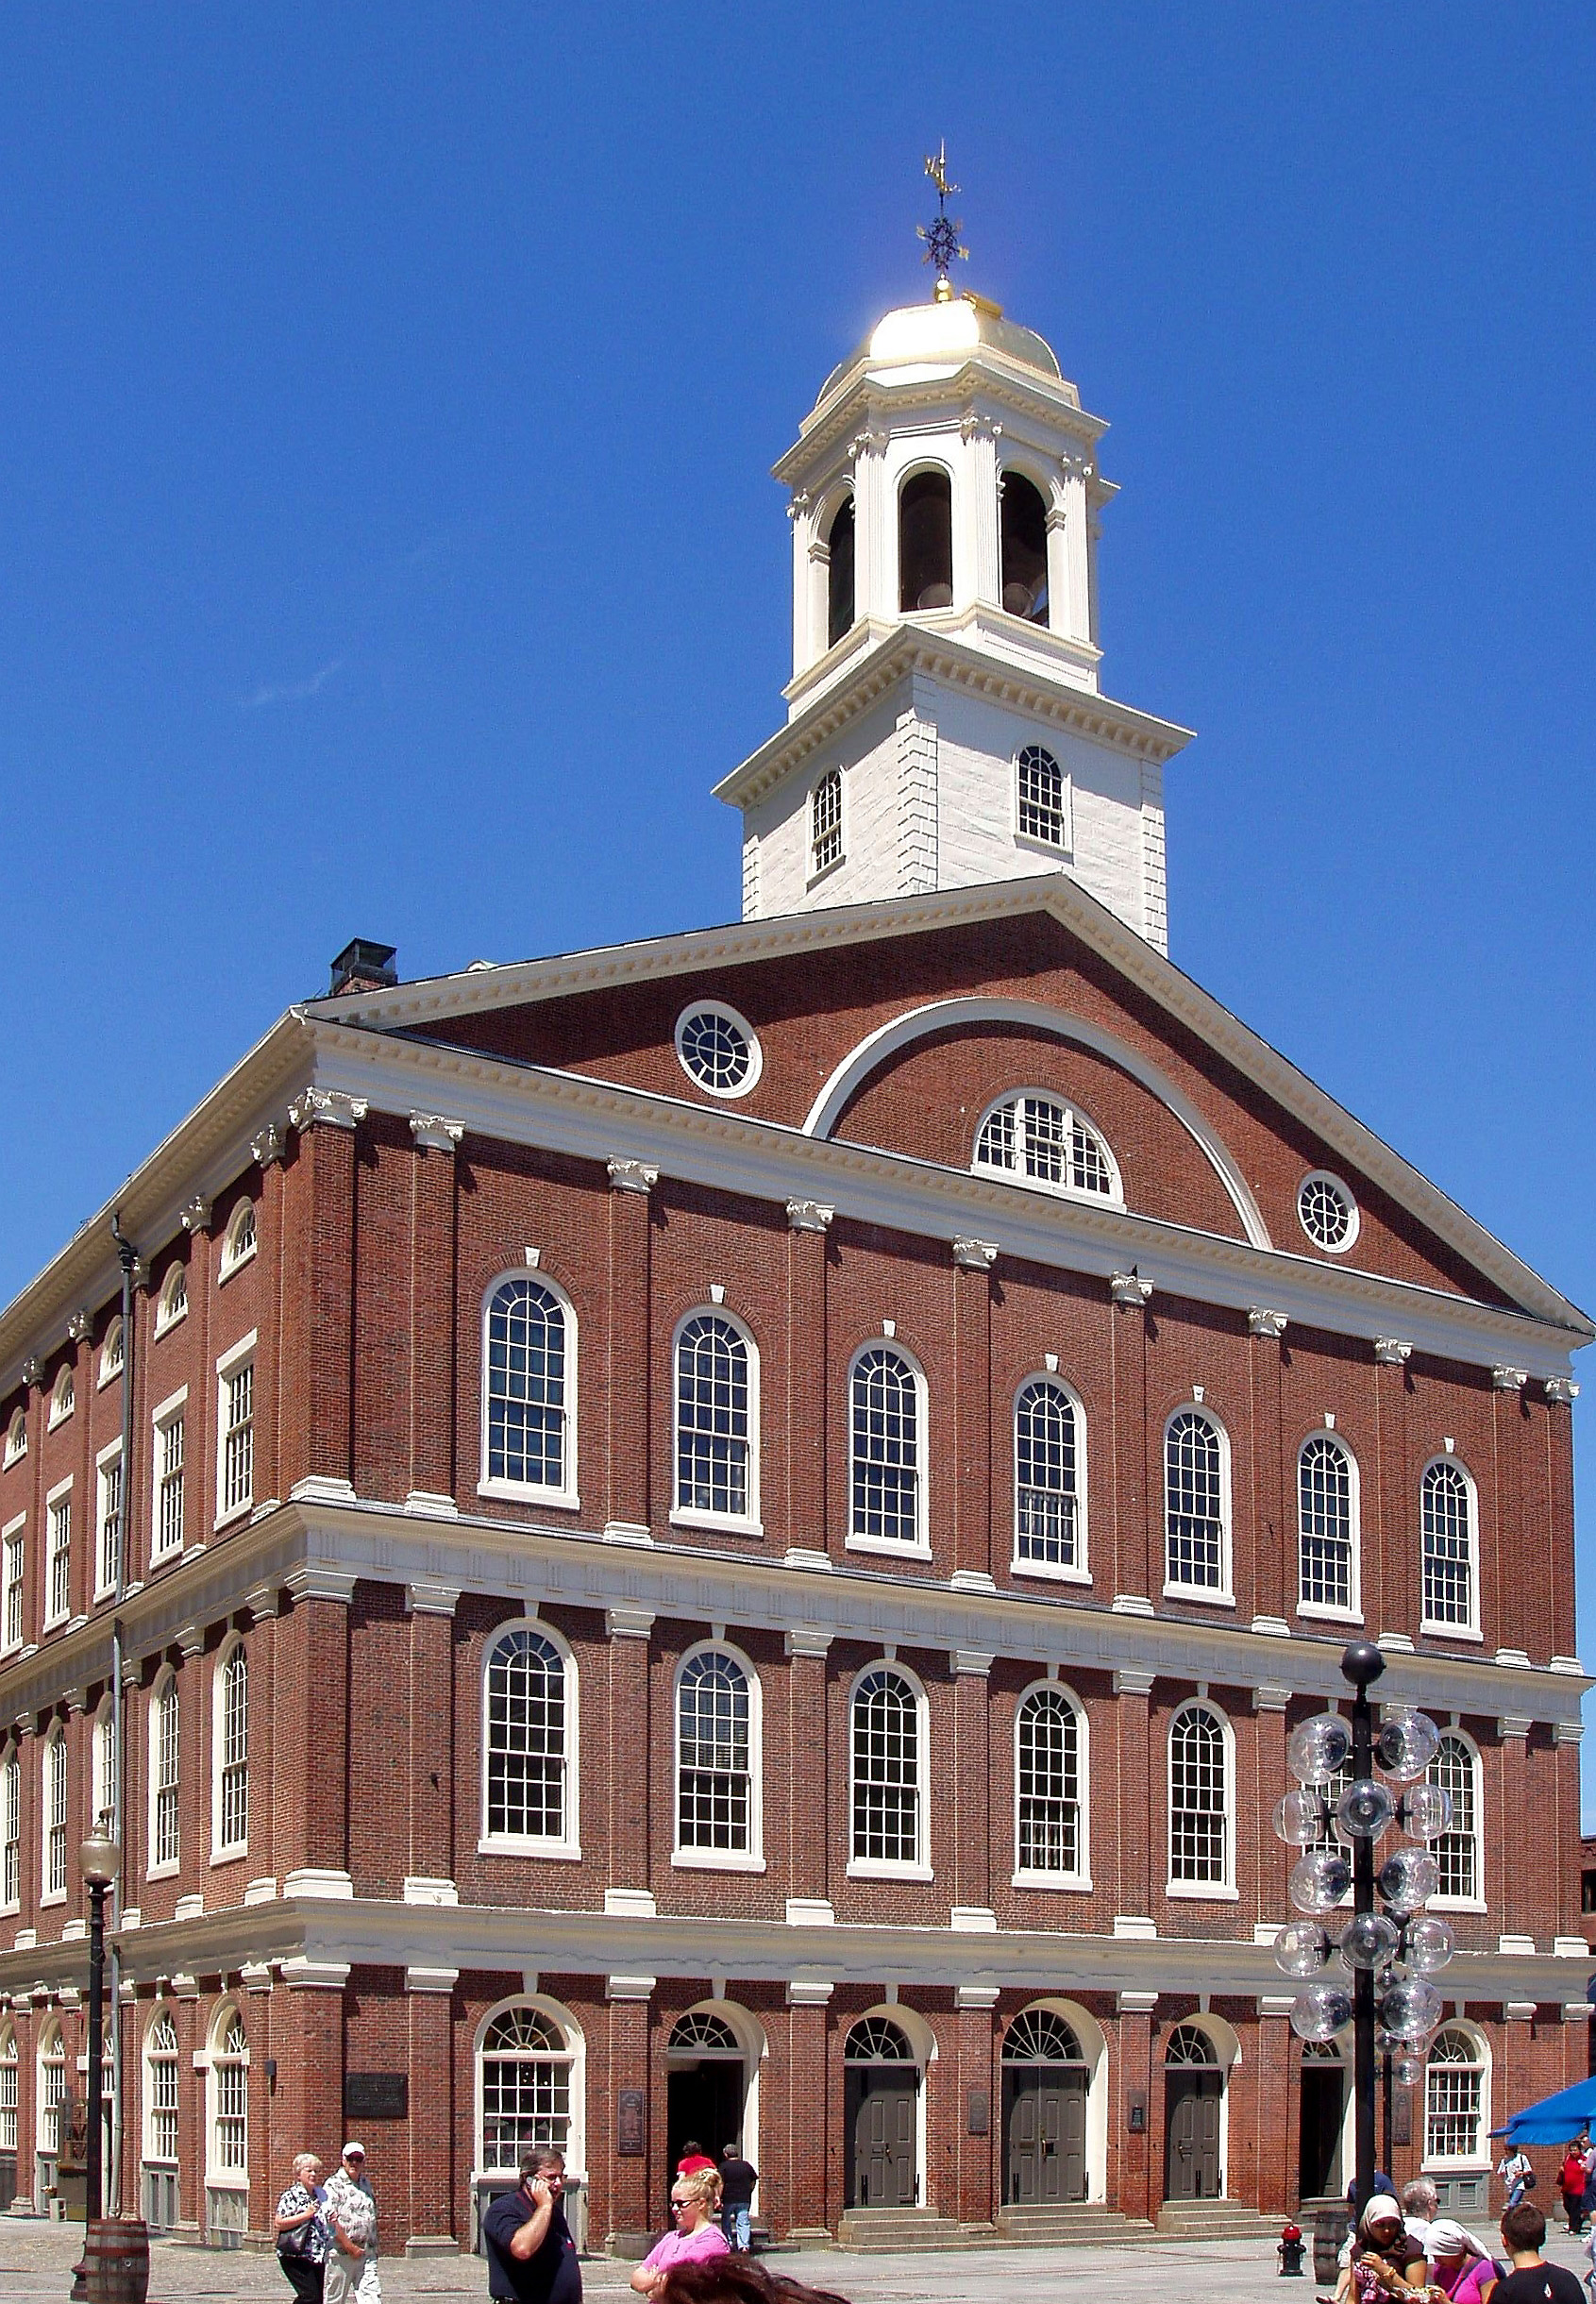 Fanueil Hall in Boston